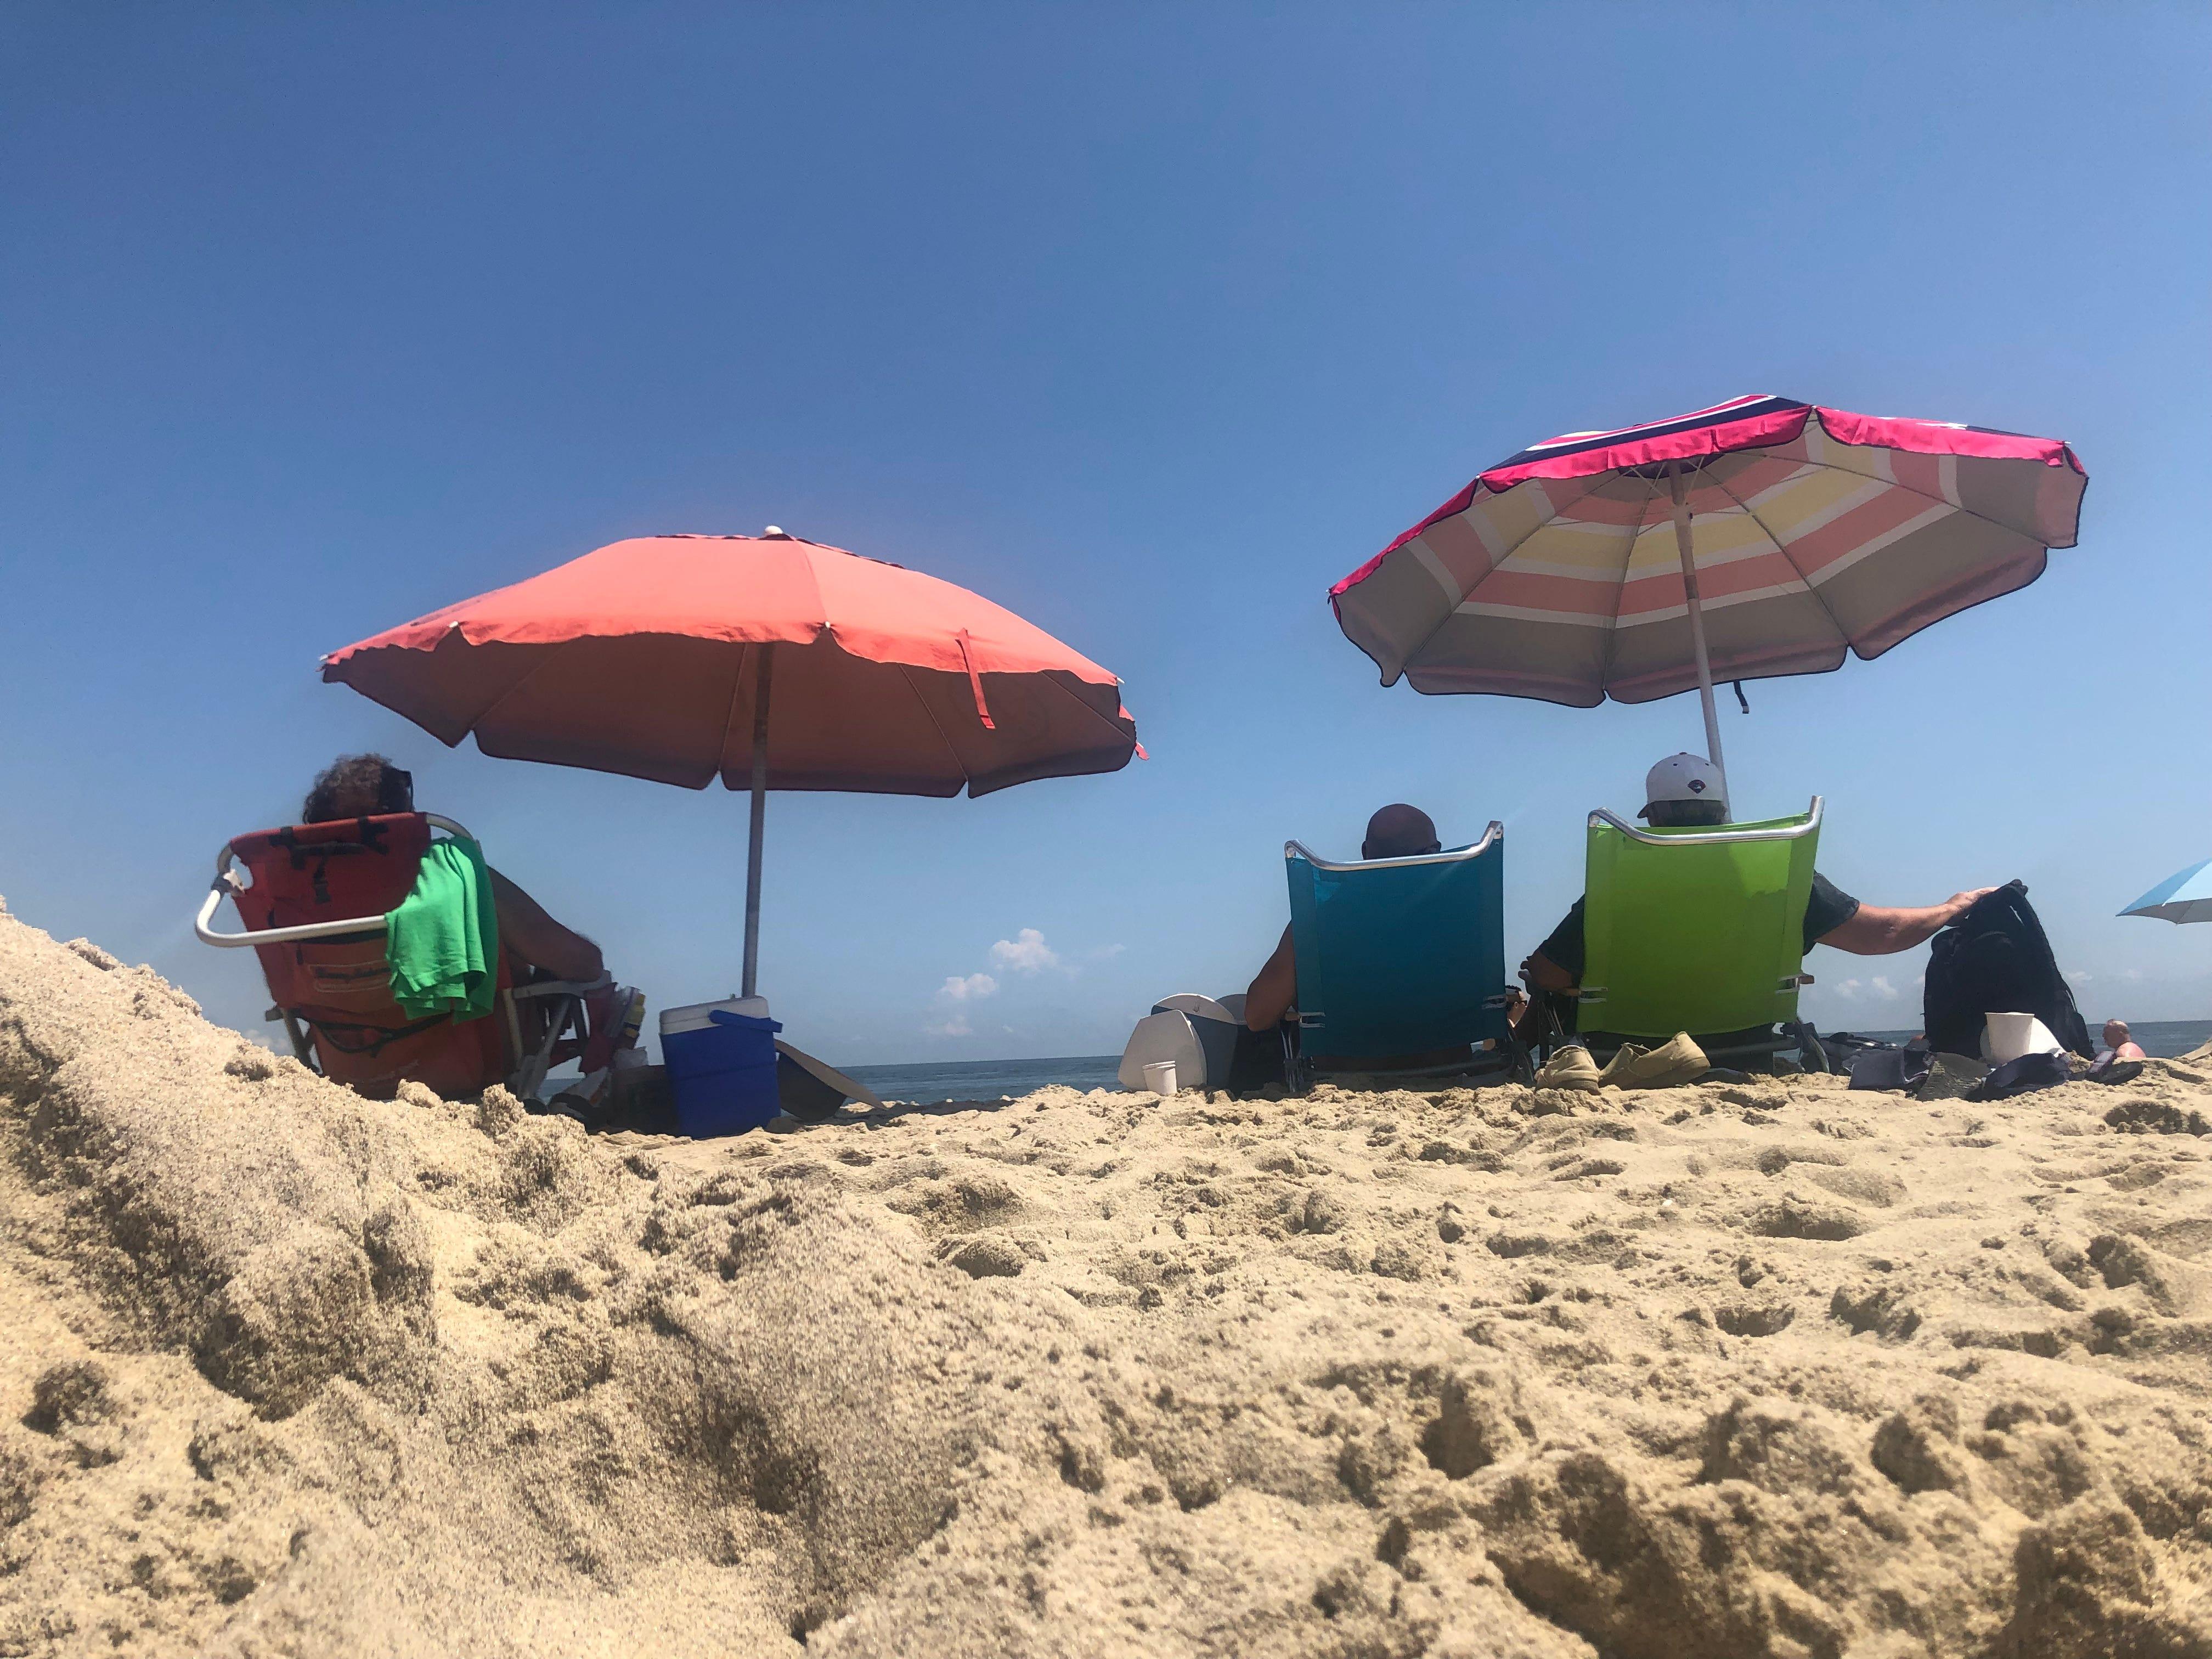 Photos of nude beach